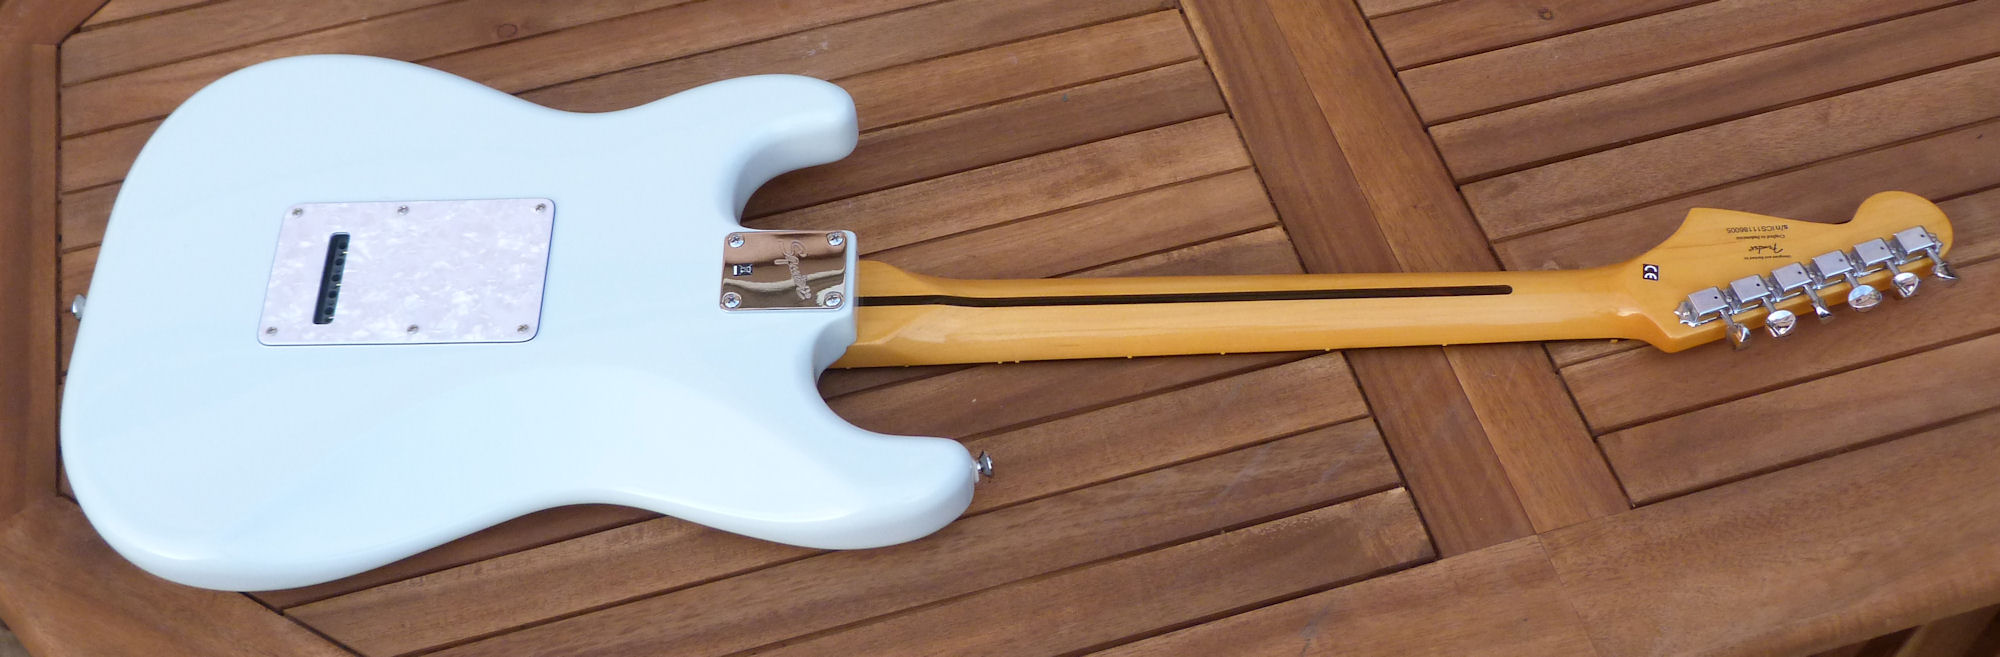 squier vintage modified surf stratocaster image 595559 audiofanzine. Black Bedroom Furniture Sets. Home Design Ideas